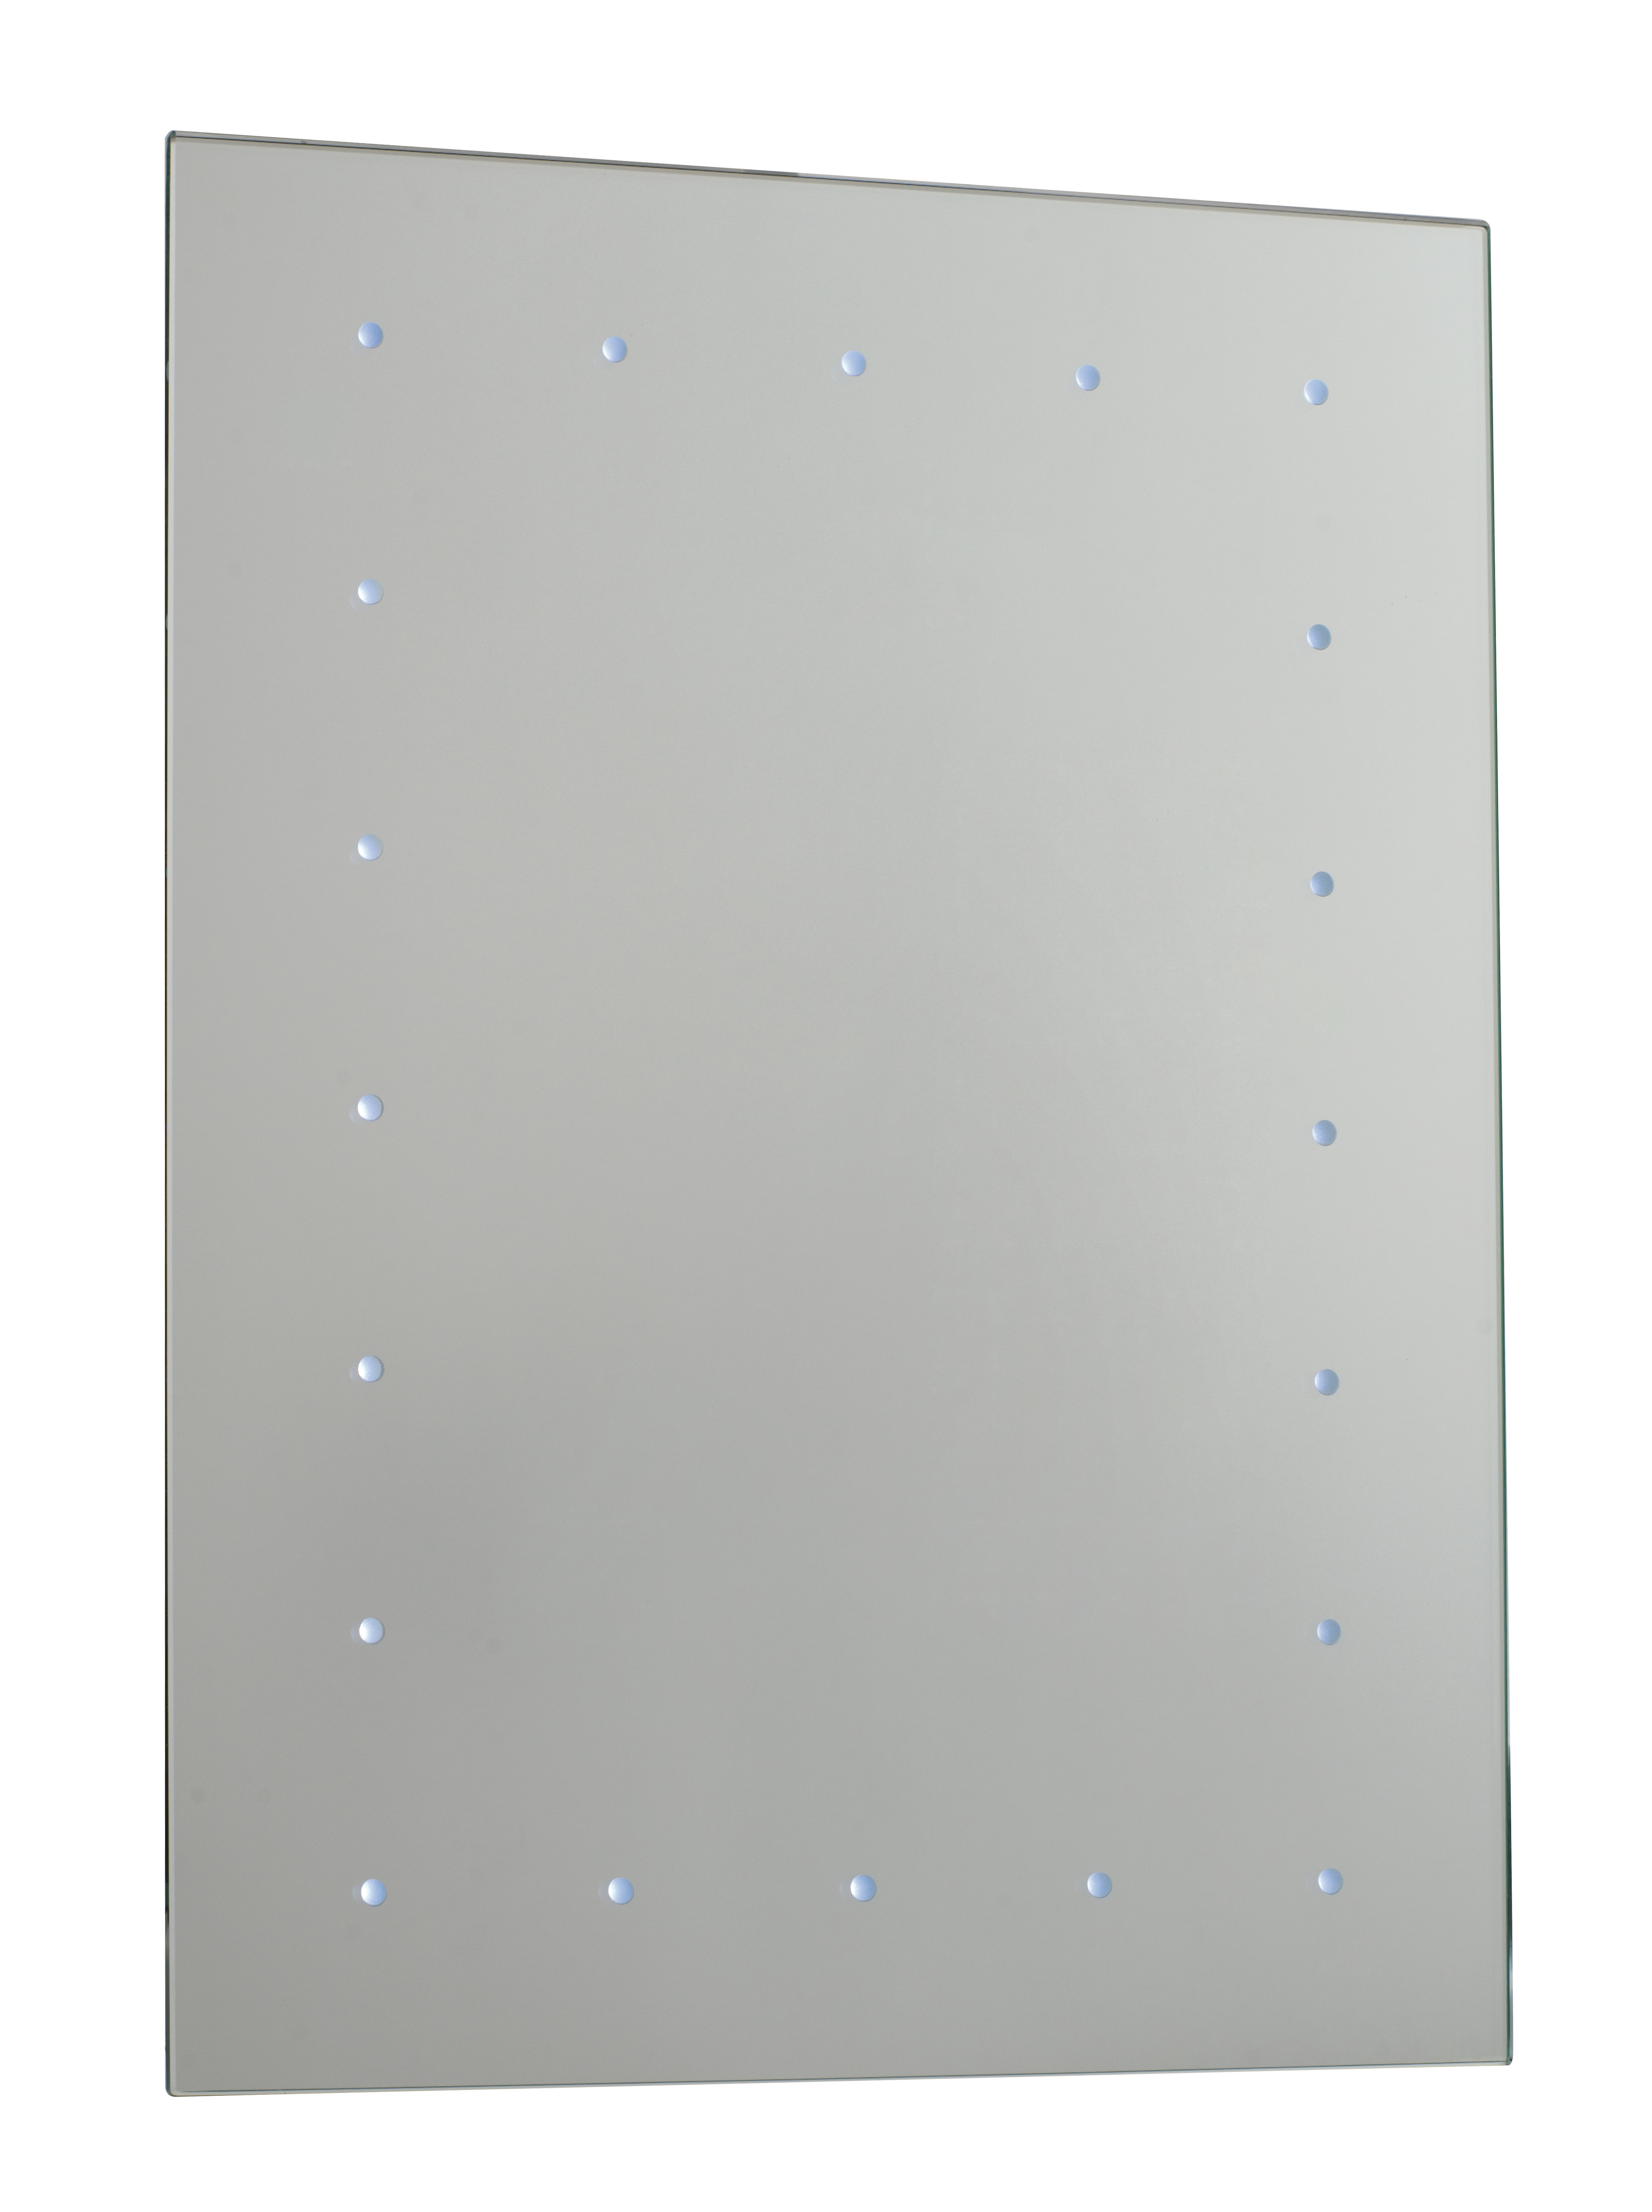 saxby toba battery operated led illuminated bathroom. Black Bedroom Furniture Sets. Home Design Ideas